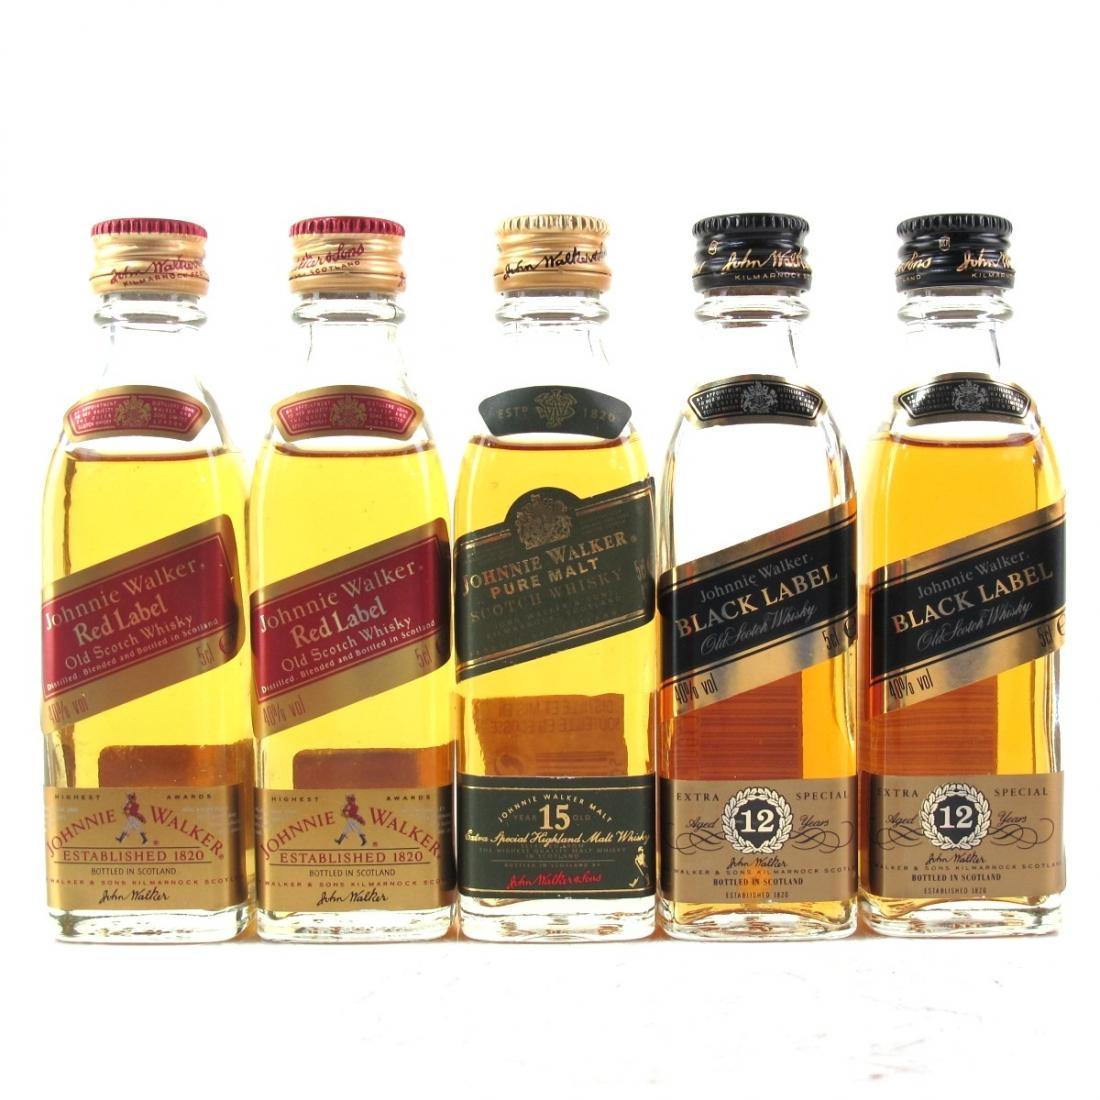 Miscellaneous Johnnie Walker Miniature Selection 5 x 5cl